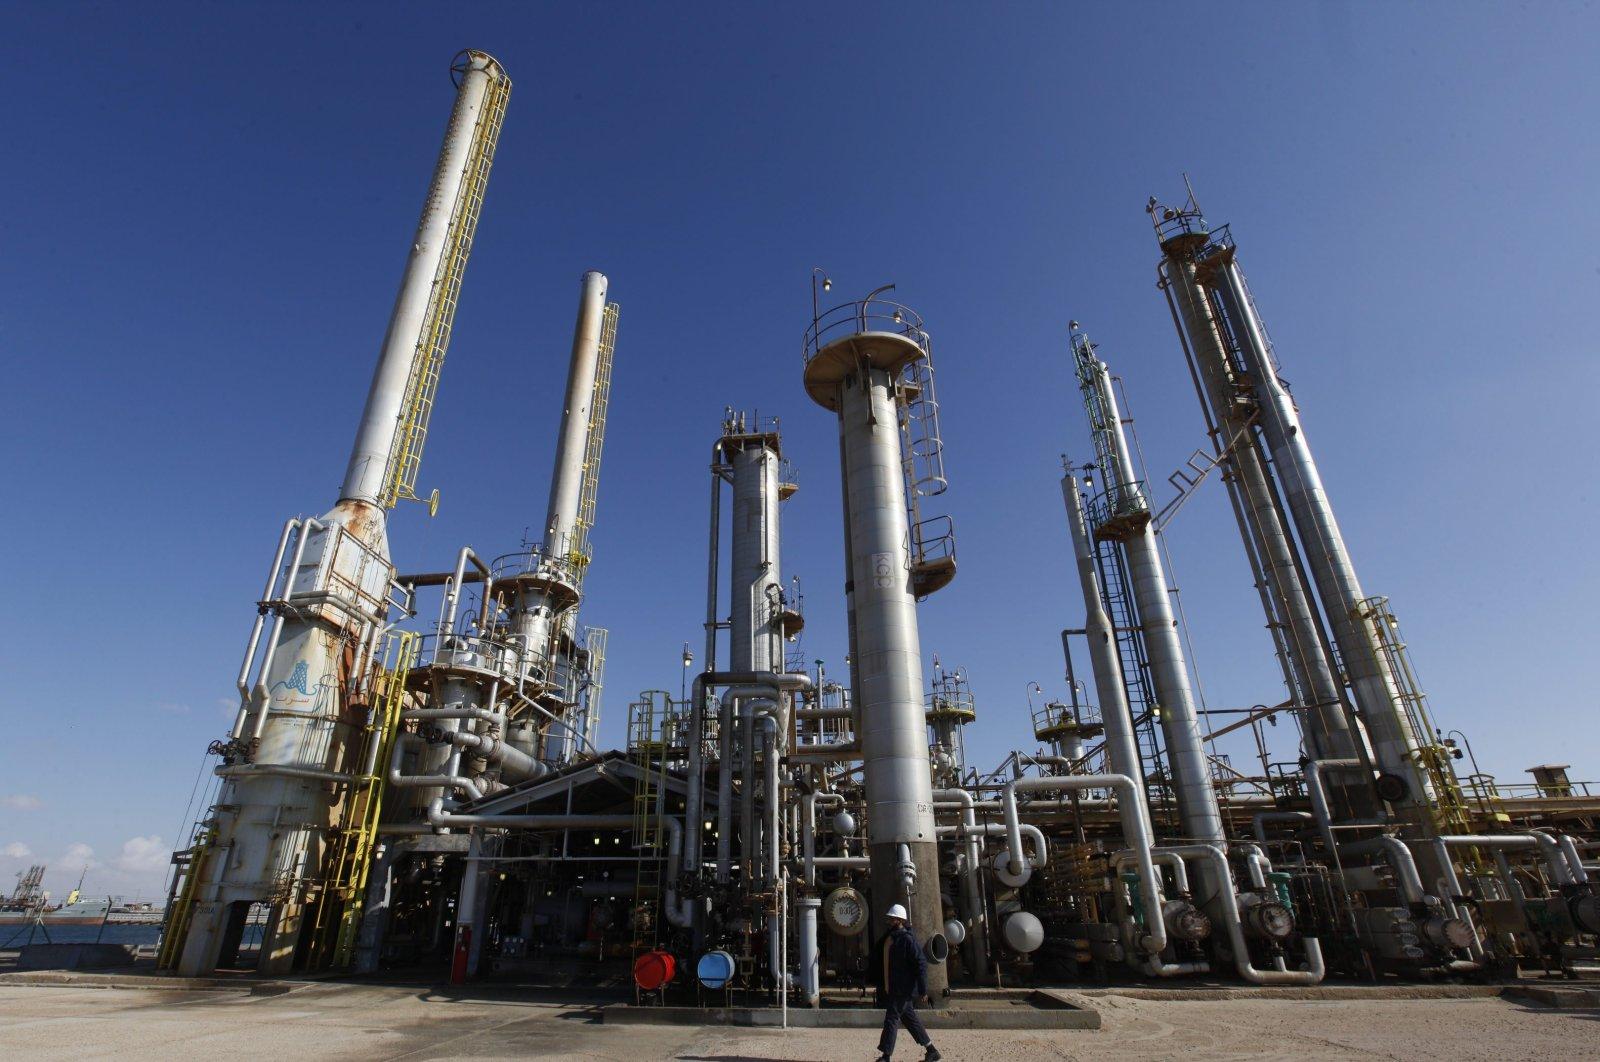 A Libyan oil worker walks in front of a refinery inside the Brega oil complex, in Brega, eastern Libya, Feb. 26, 2011. (AP Photo)